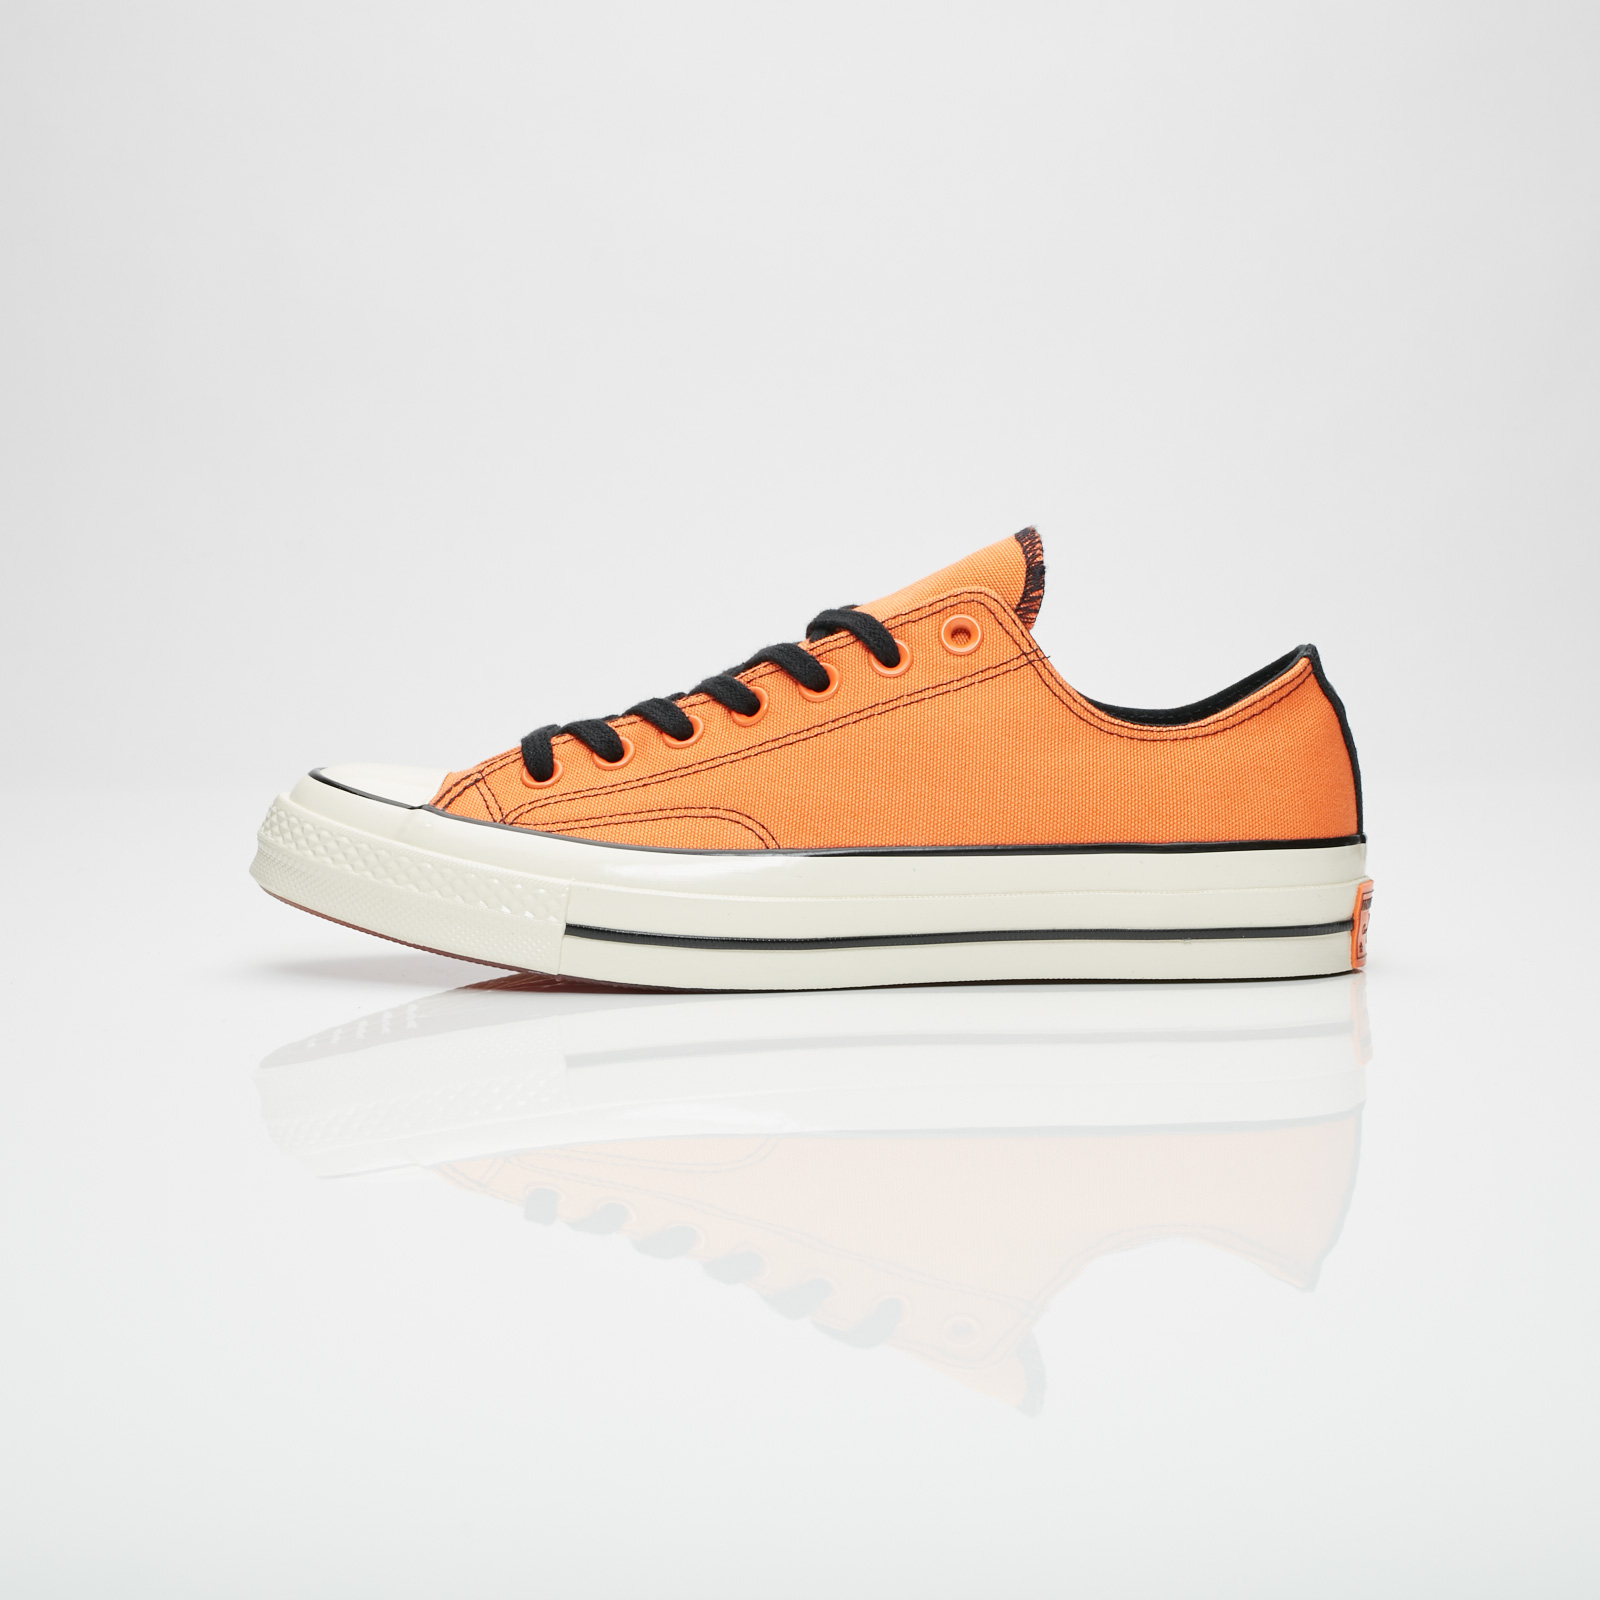 Vince Staples x Converse Orange : streetwear